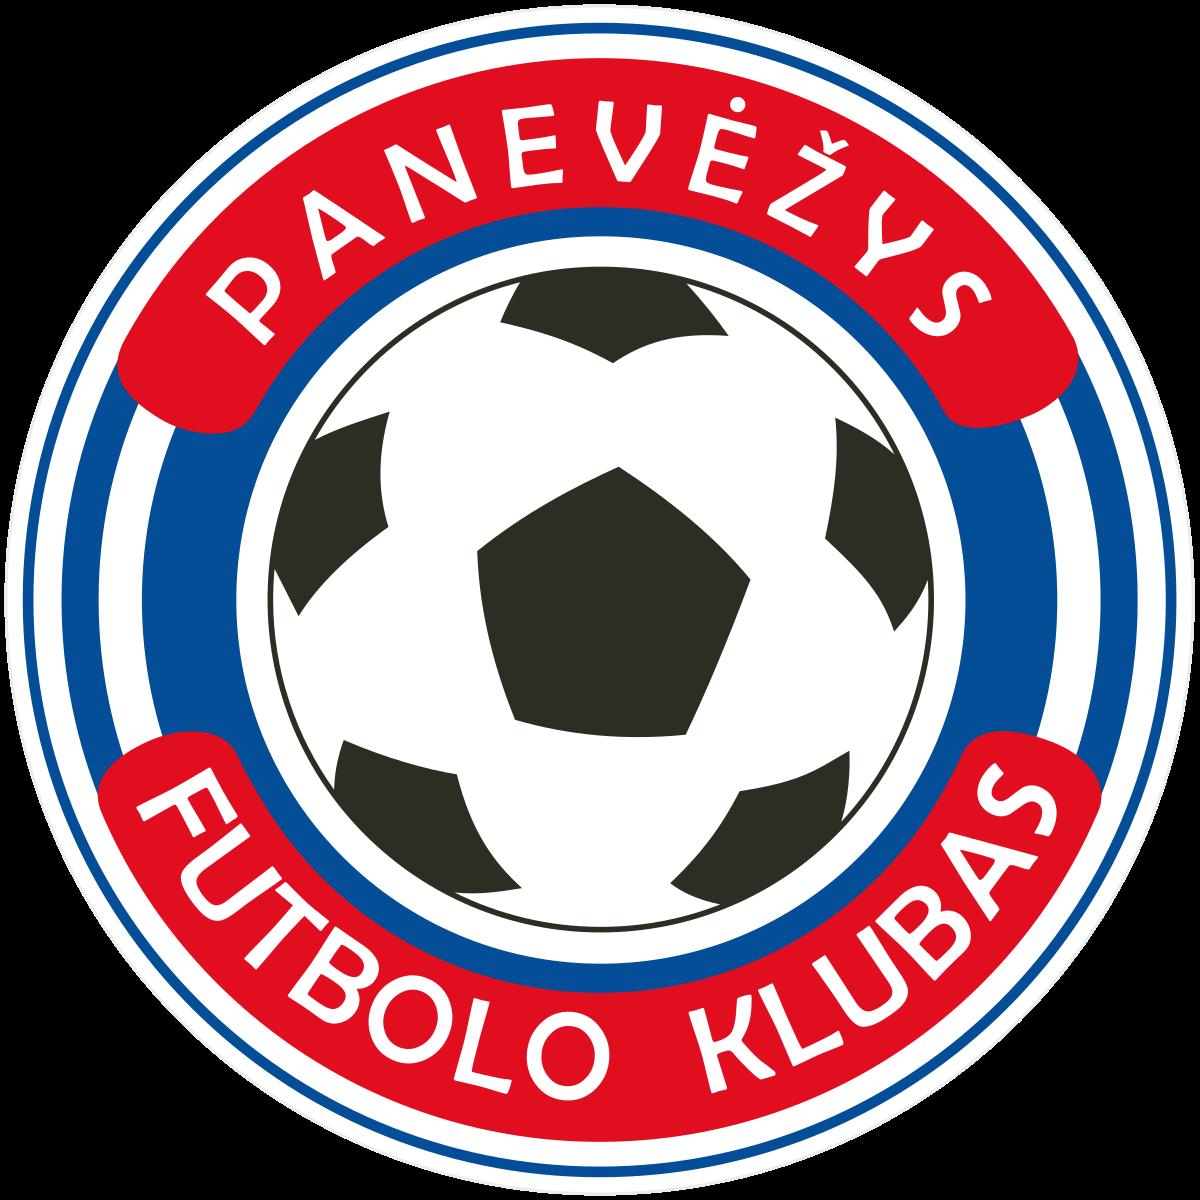 Panevezys-2 logo